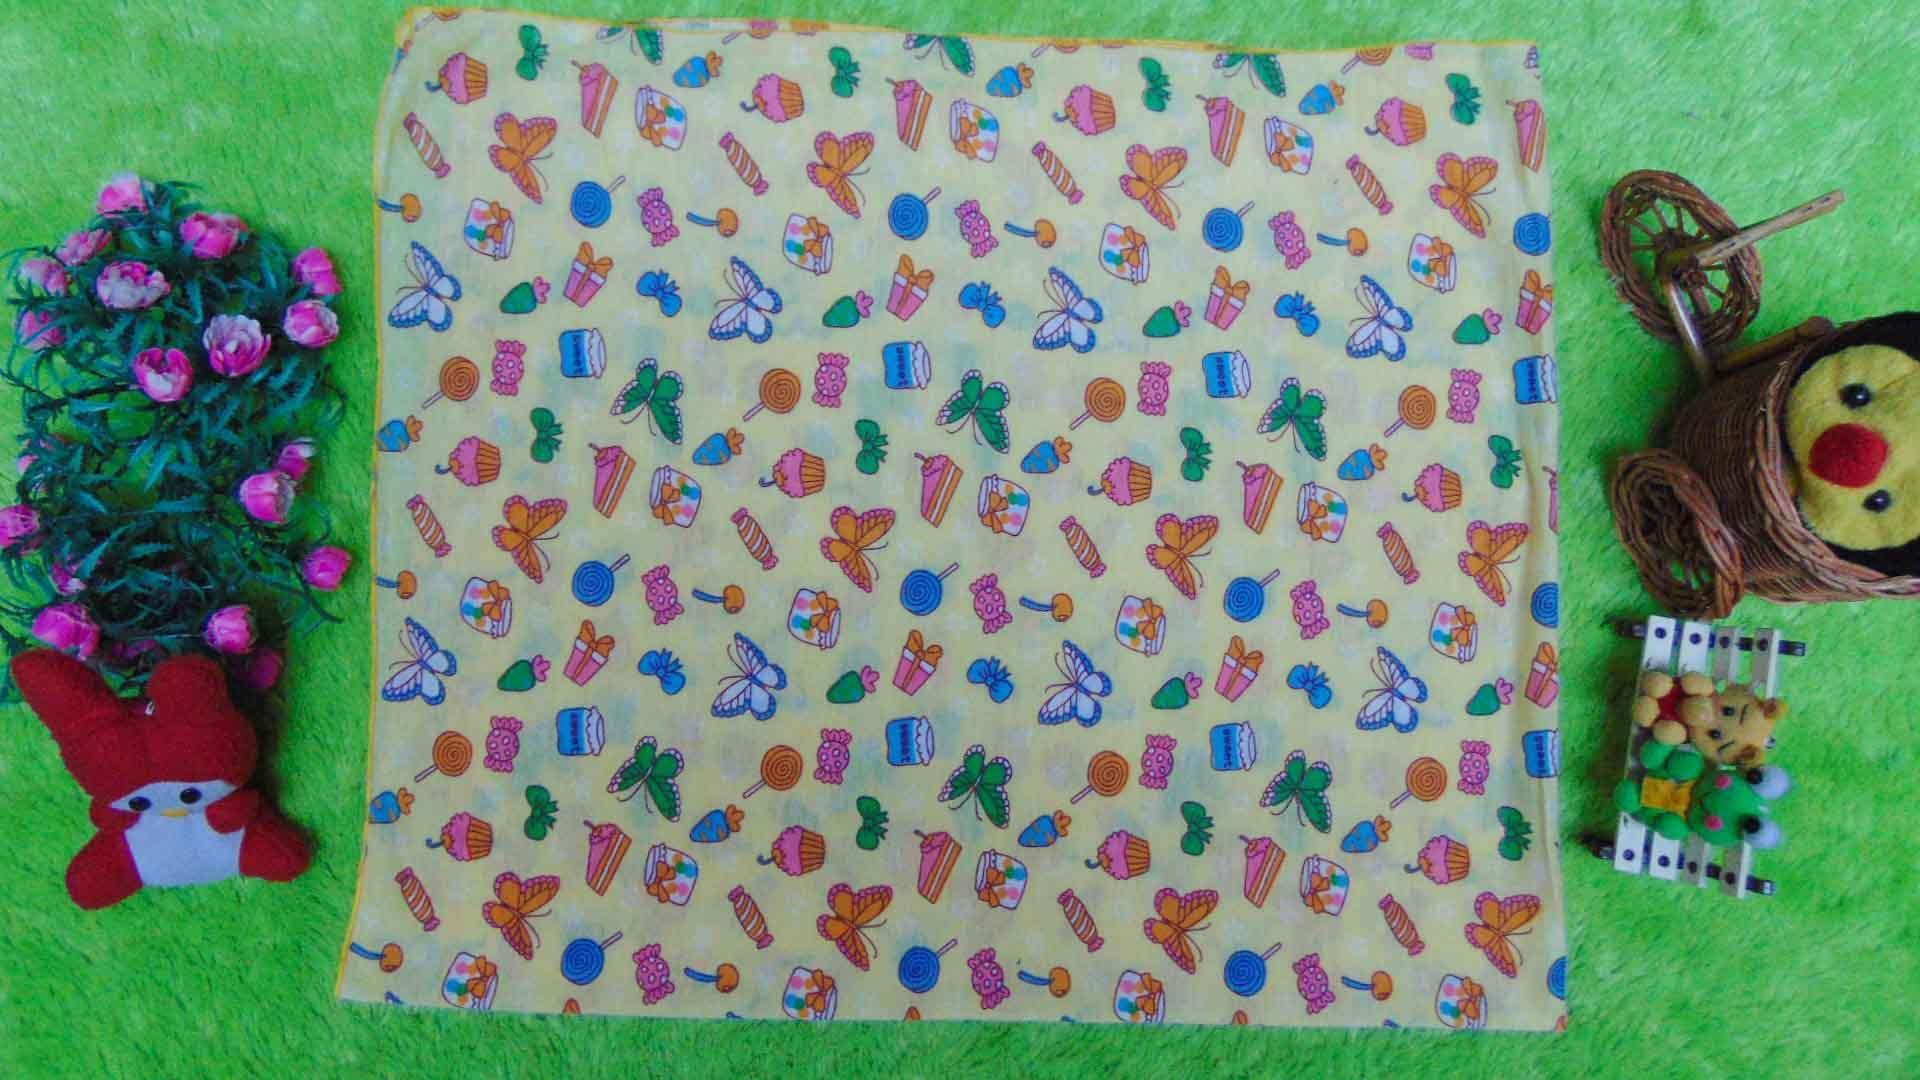 Dita Baby Collection Bedong Instan Topi 2in1 - Kuning. Source · kembarshop - kain bedong kaos jumbo besar serbaguna 3in1 motif kupu kuning